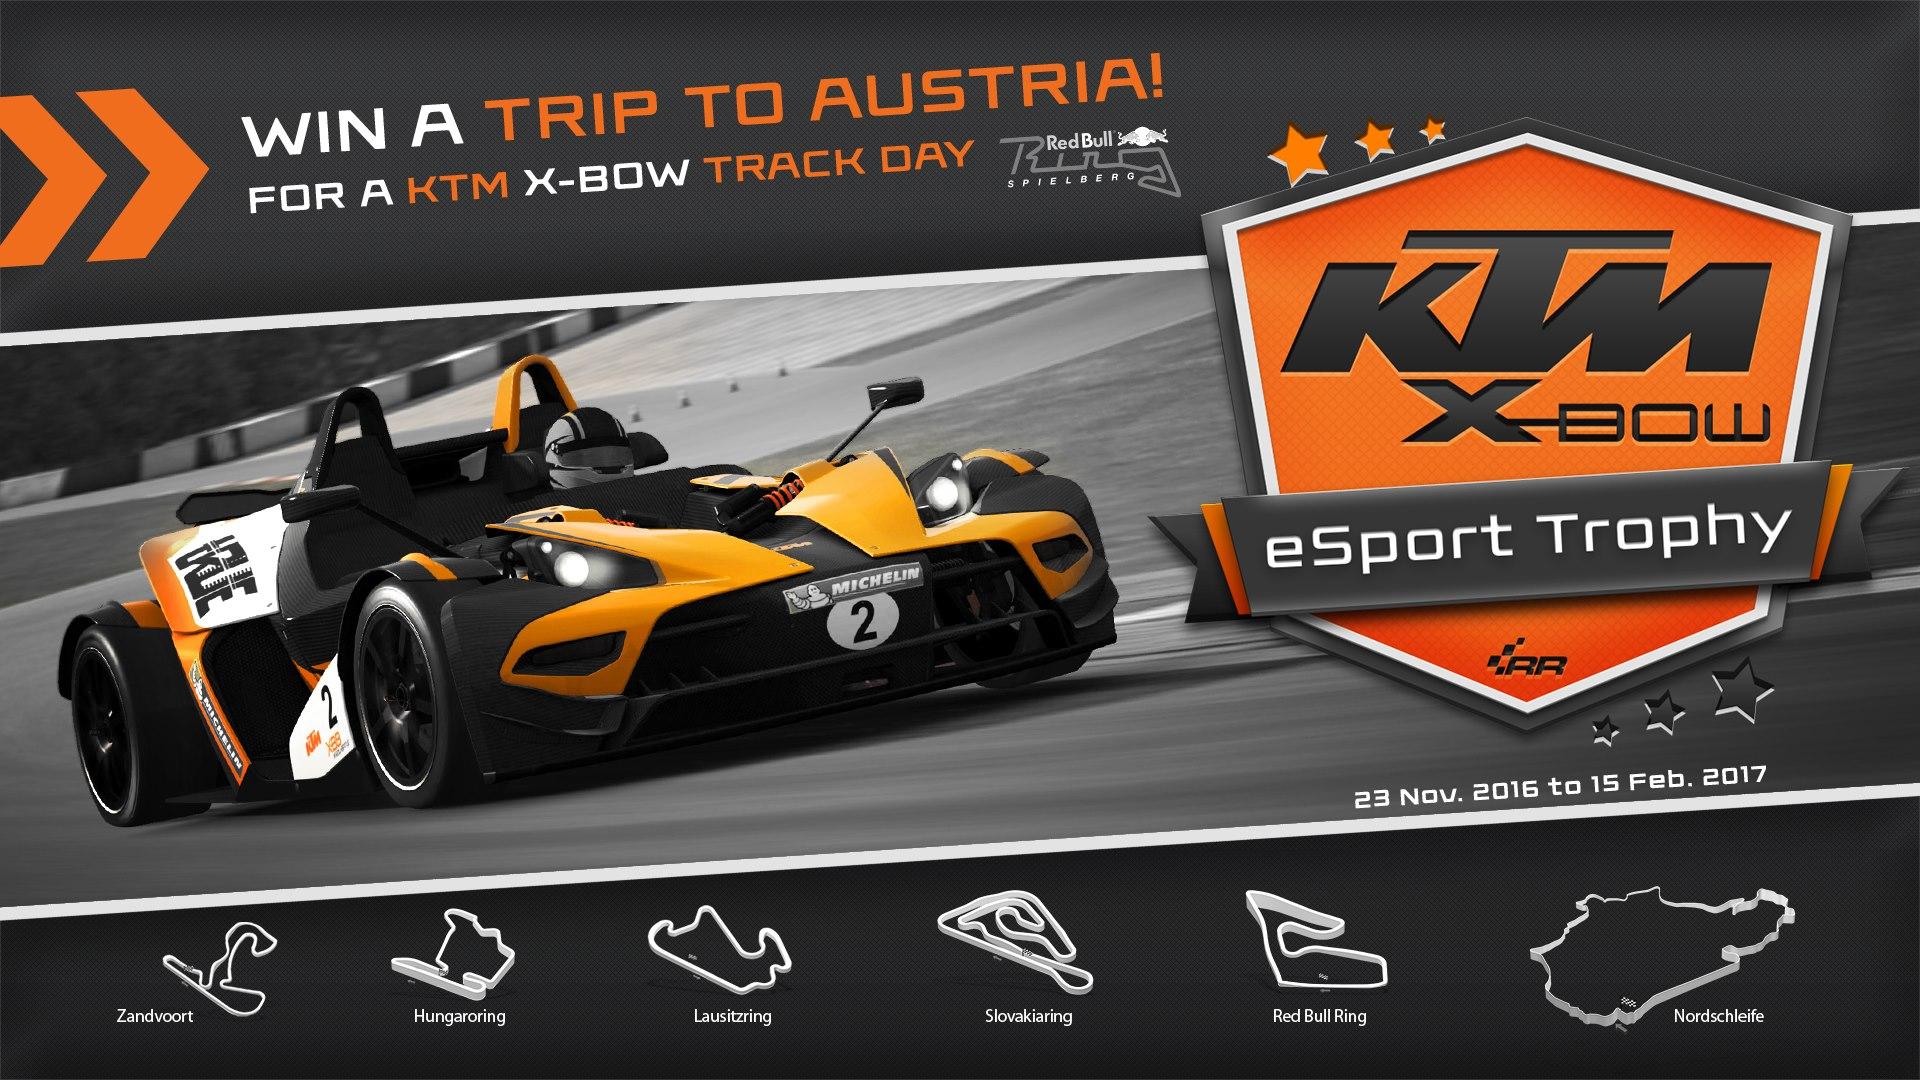 KTM X-Bow RR eSports Trophy - R3E.jpg